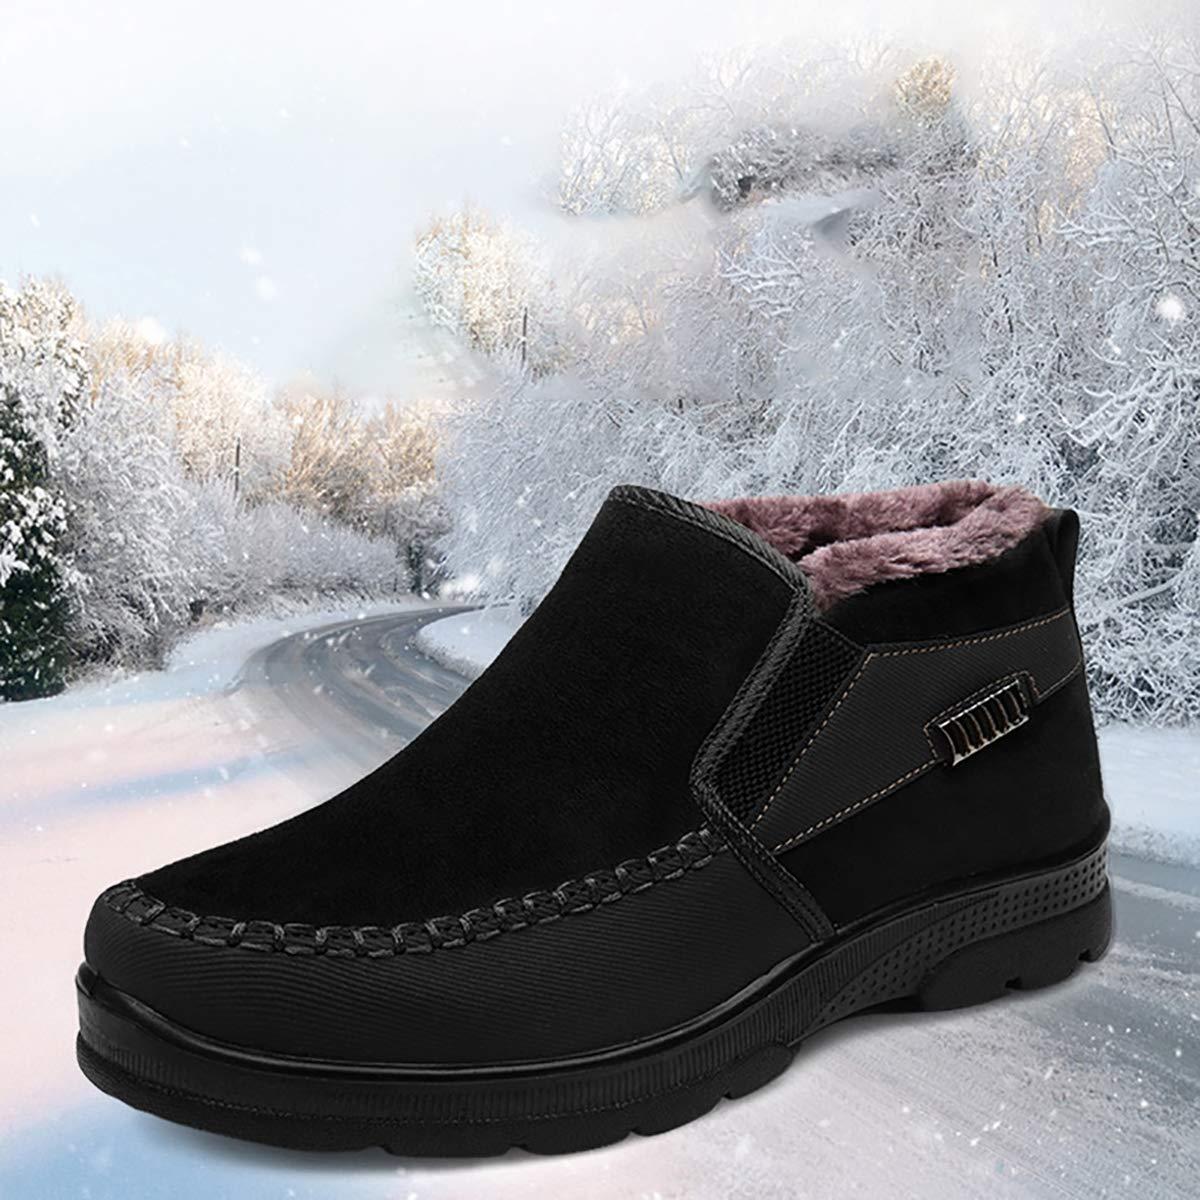 Fad-J Wintermänner lässige Schuhe, Mode Plus samtige warme Baumwollschuhe, runde Kopfschuhe,schwarz,43